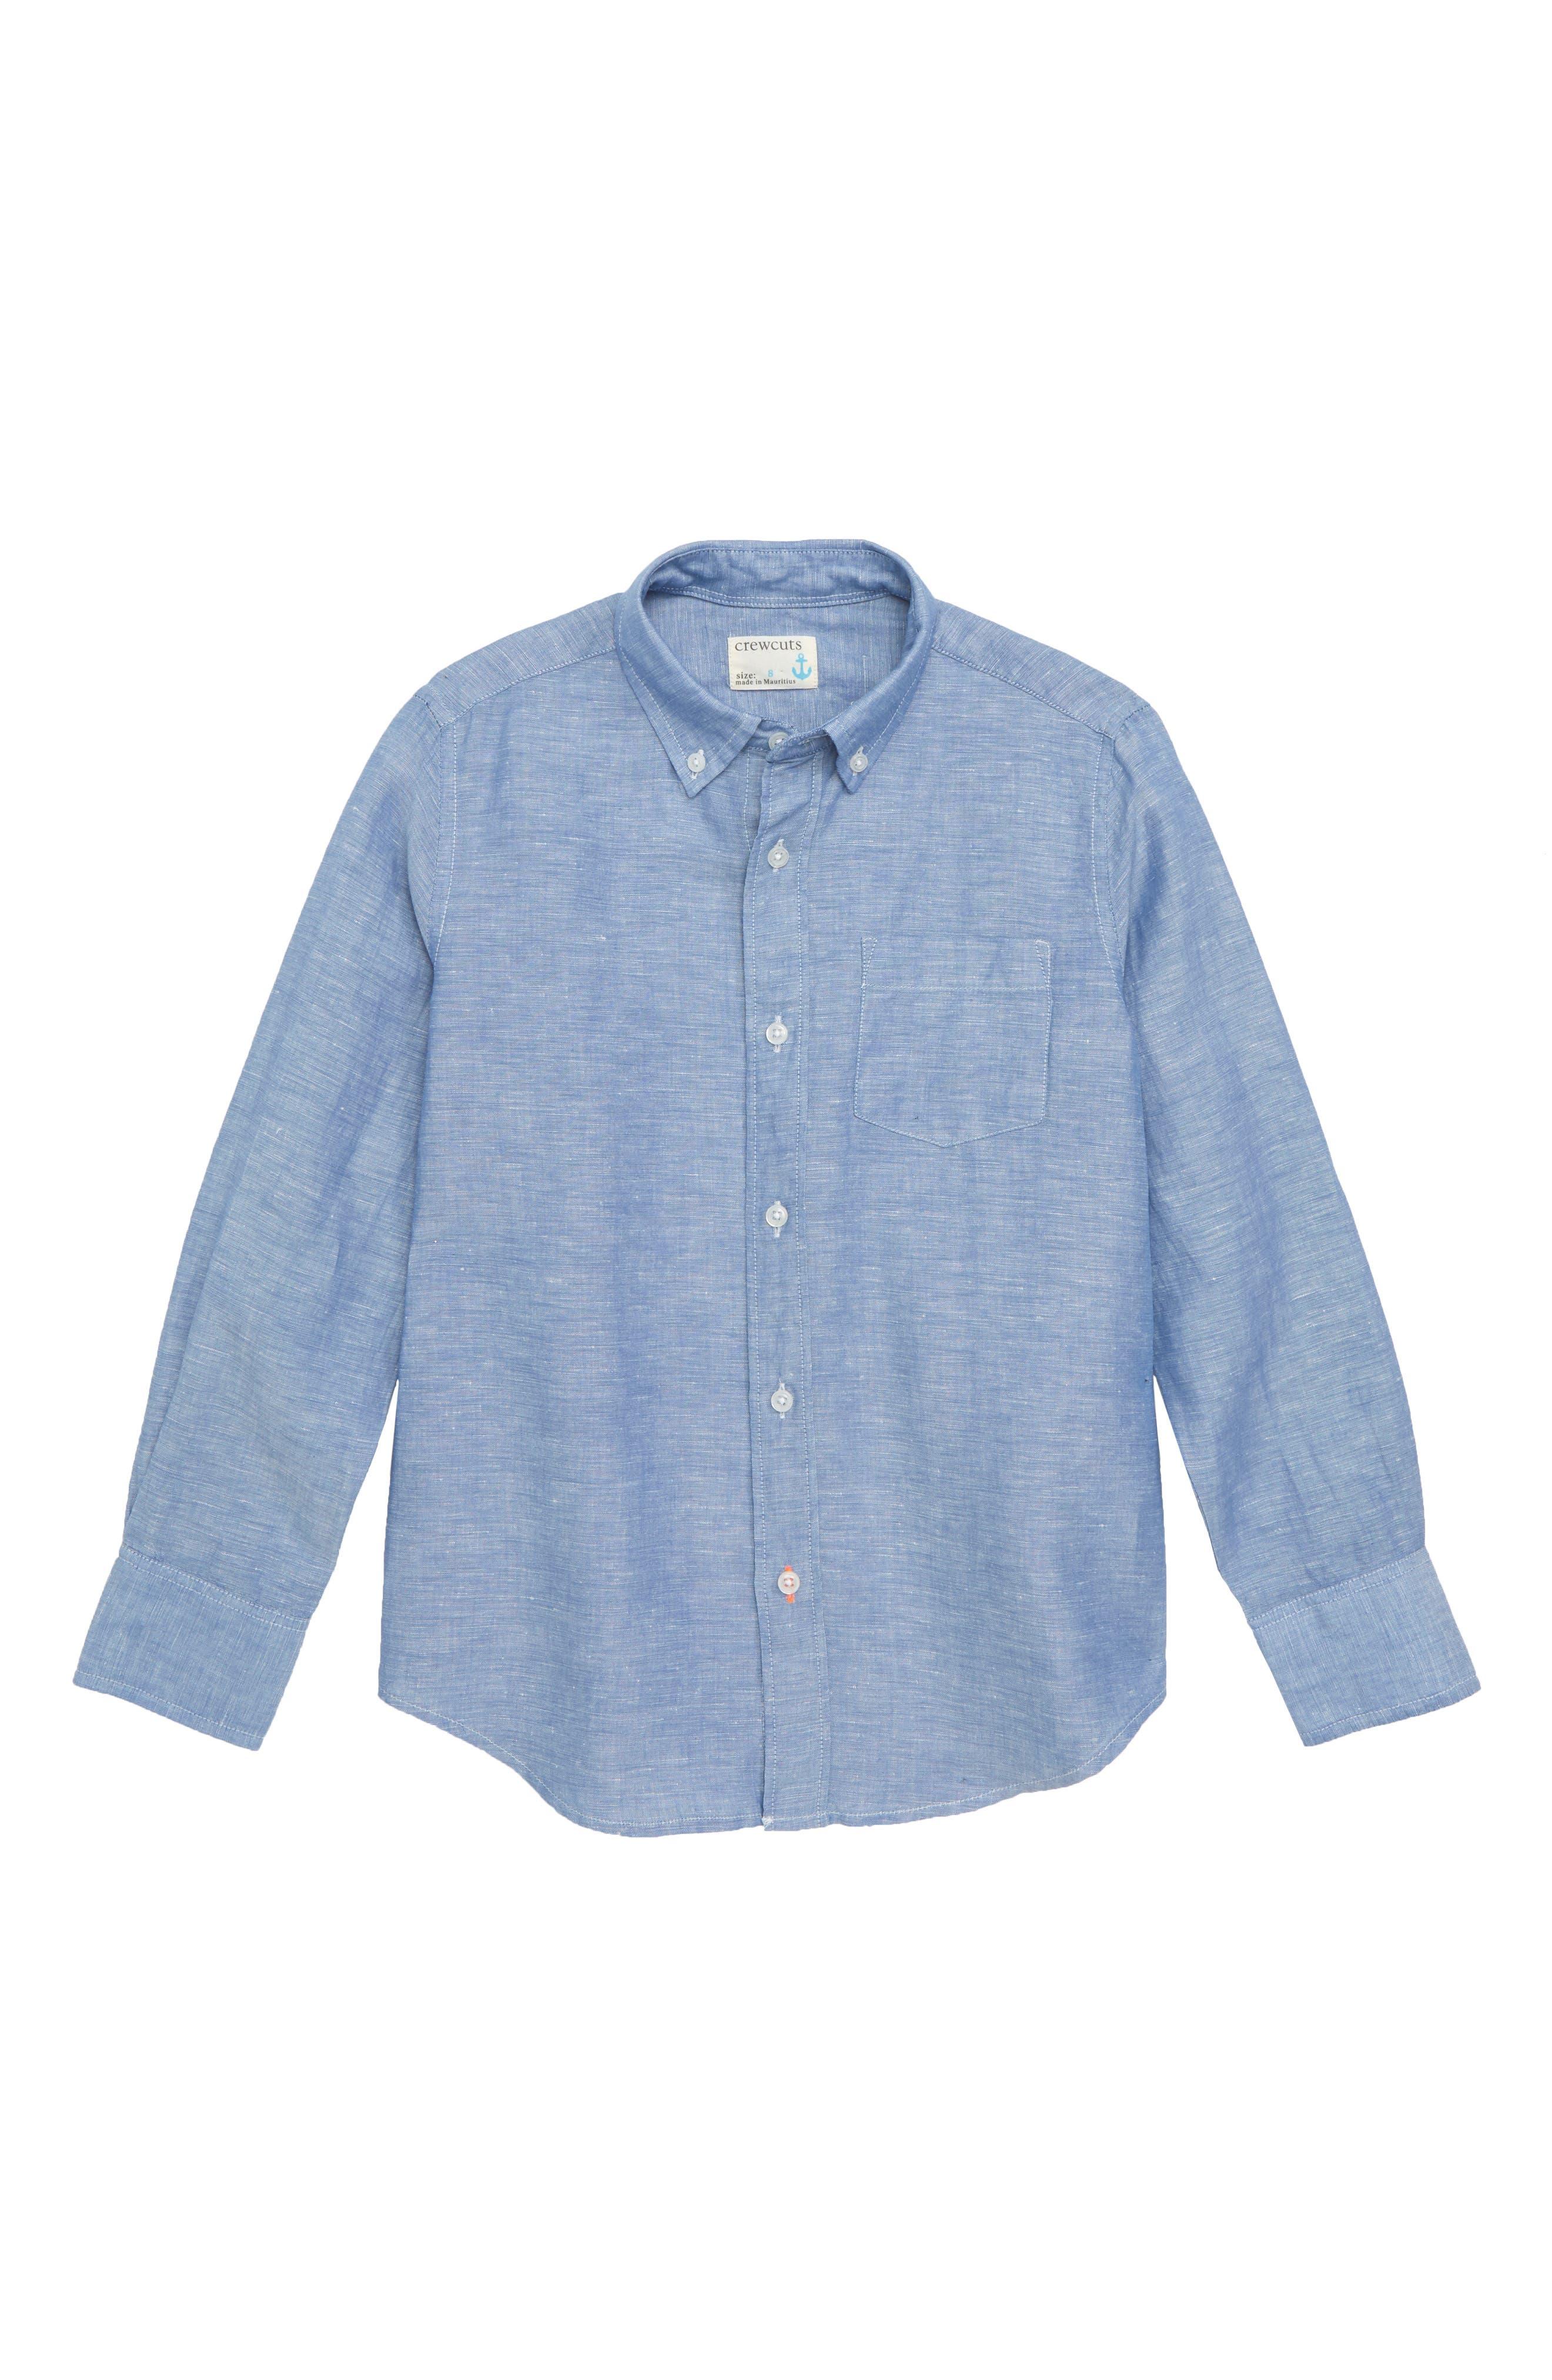 Linen & Cotton Shirt,                             Main thumbnail 1, color,                             Mediterranean Coast